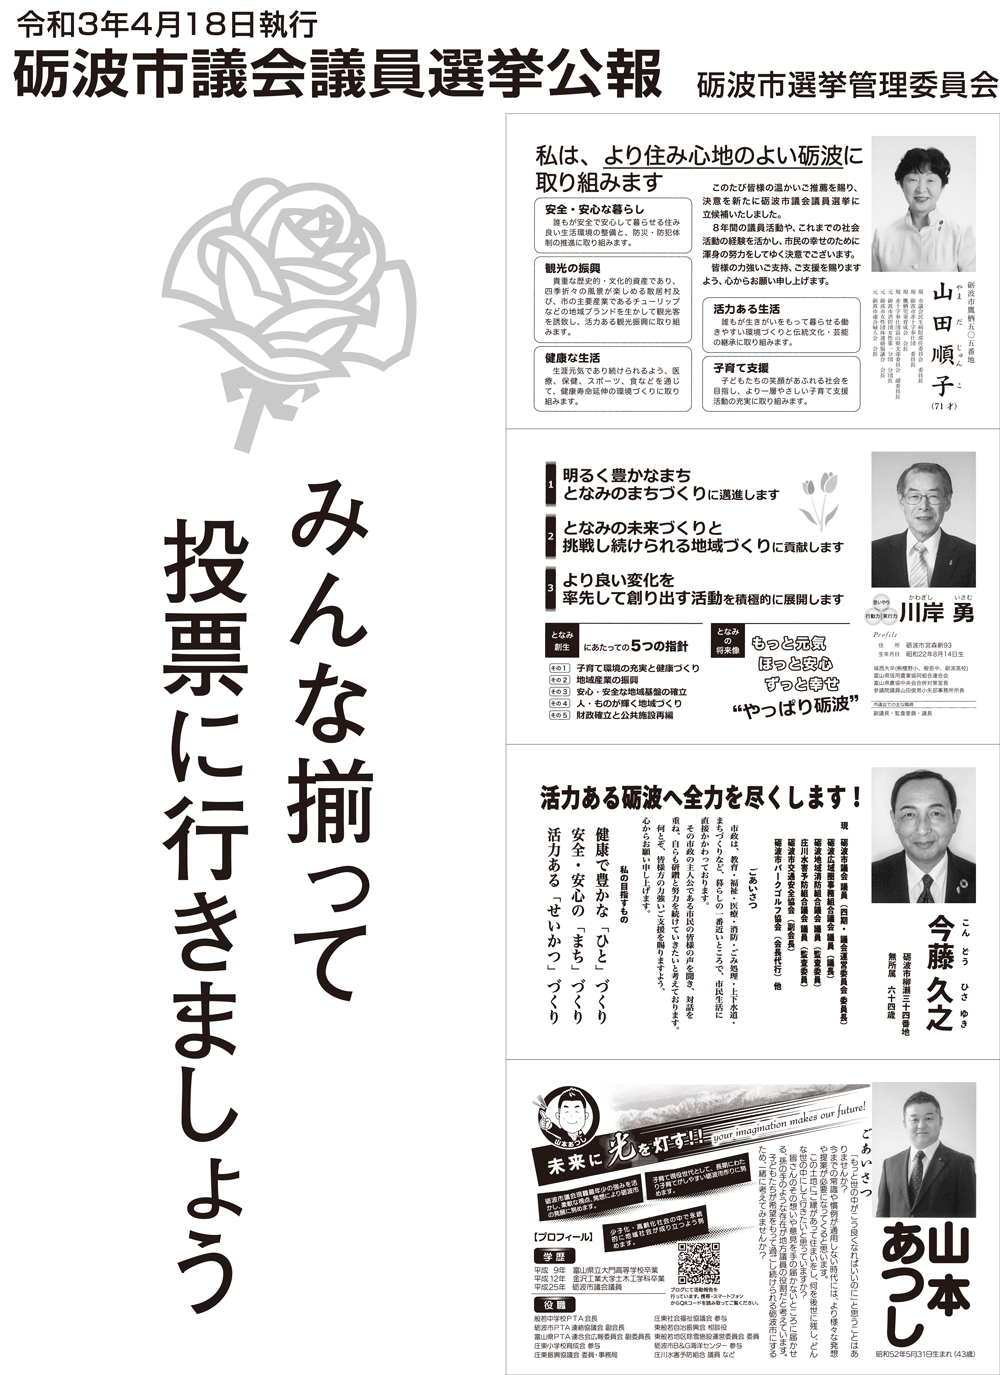 砺波市議会議員選挙2021の選挙公報3